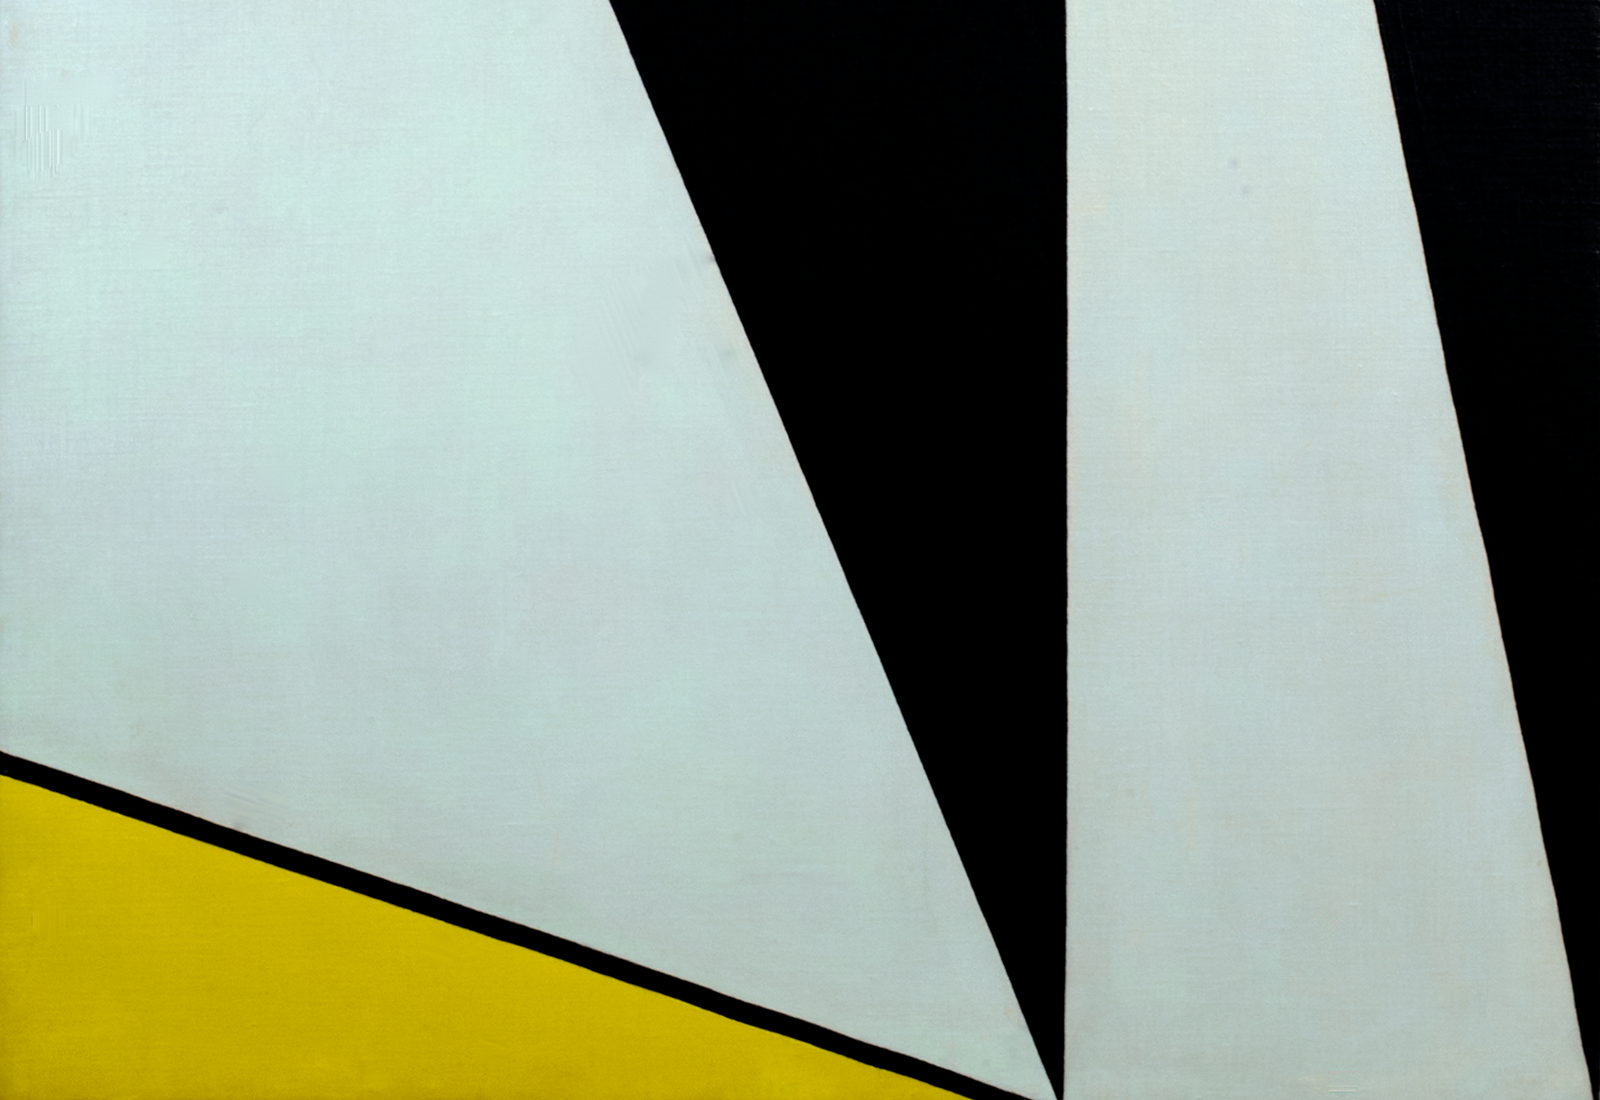 Peinture d'Olle Baertling montrant des triangles